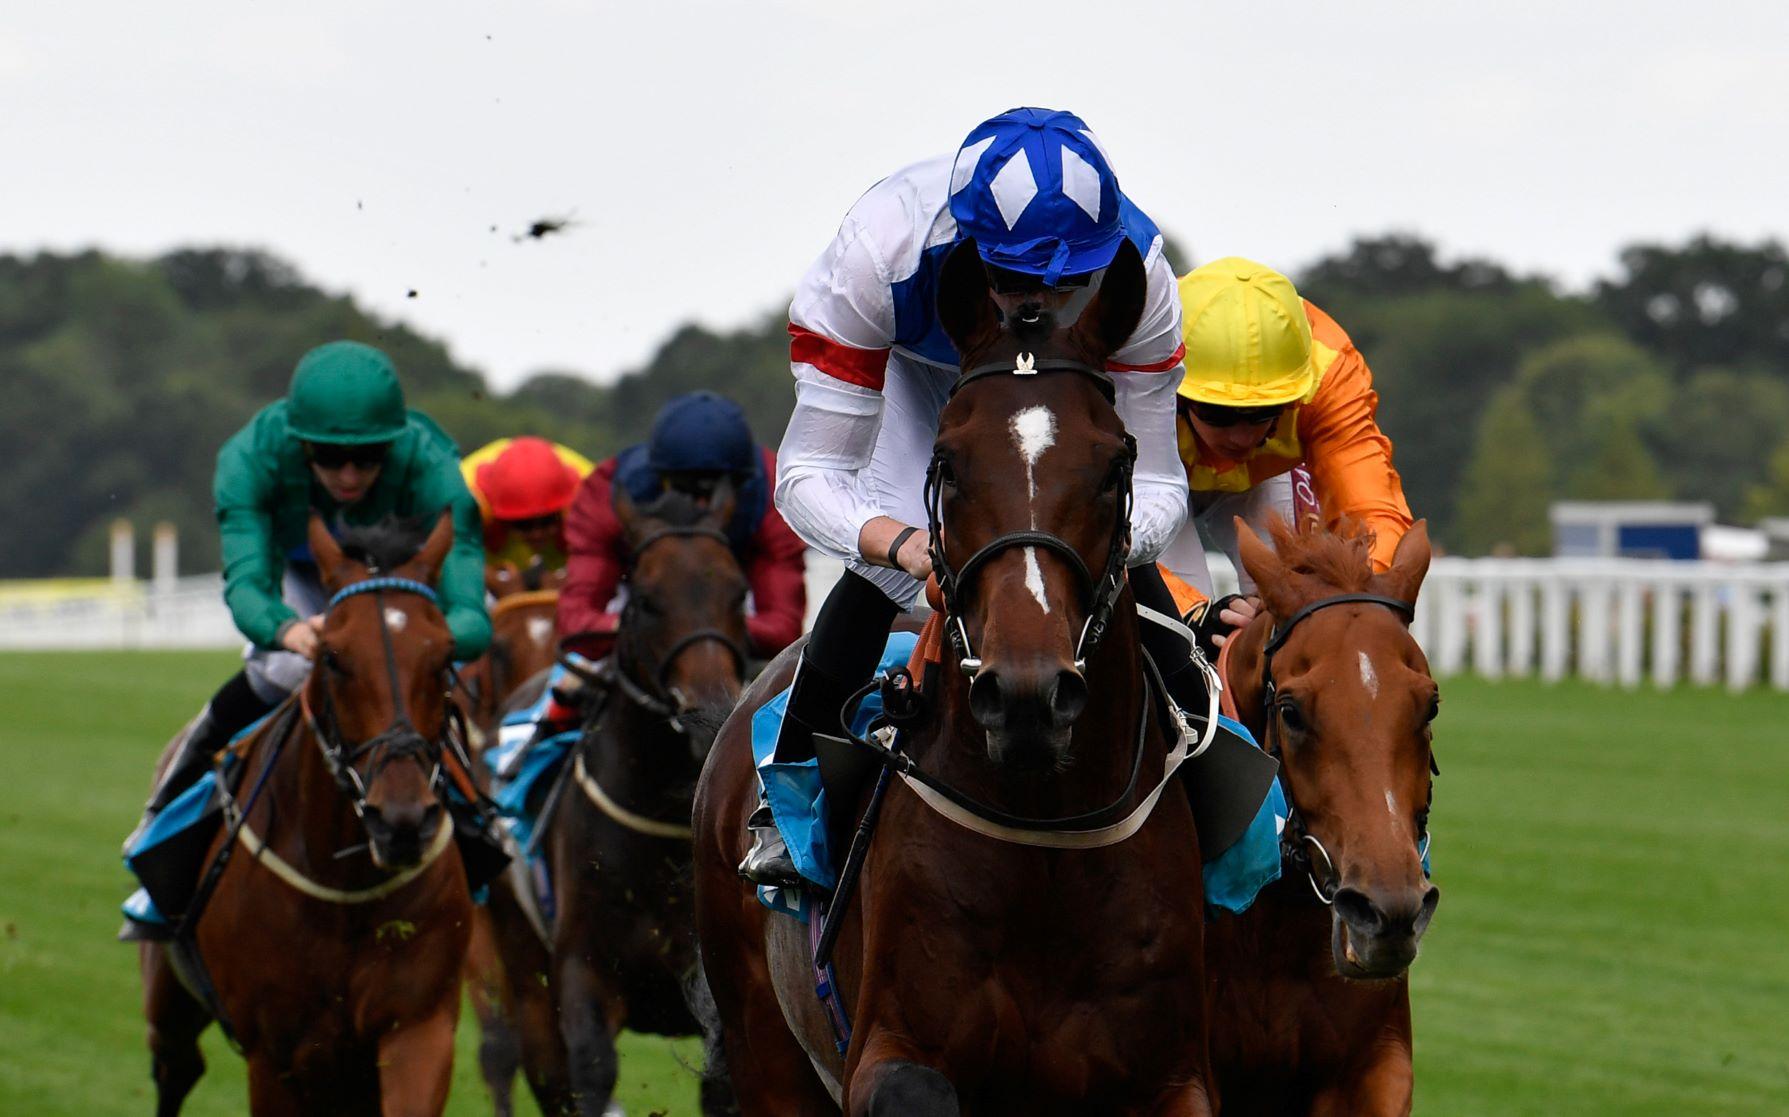 King george horse race 2021 betting online online football betting tricks